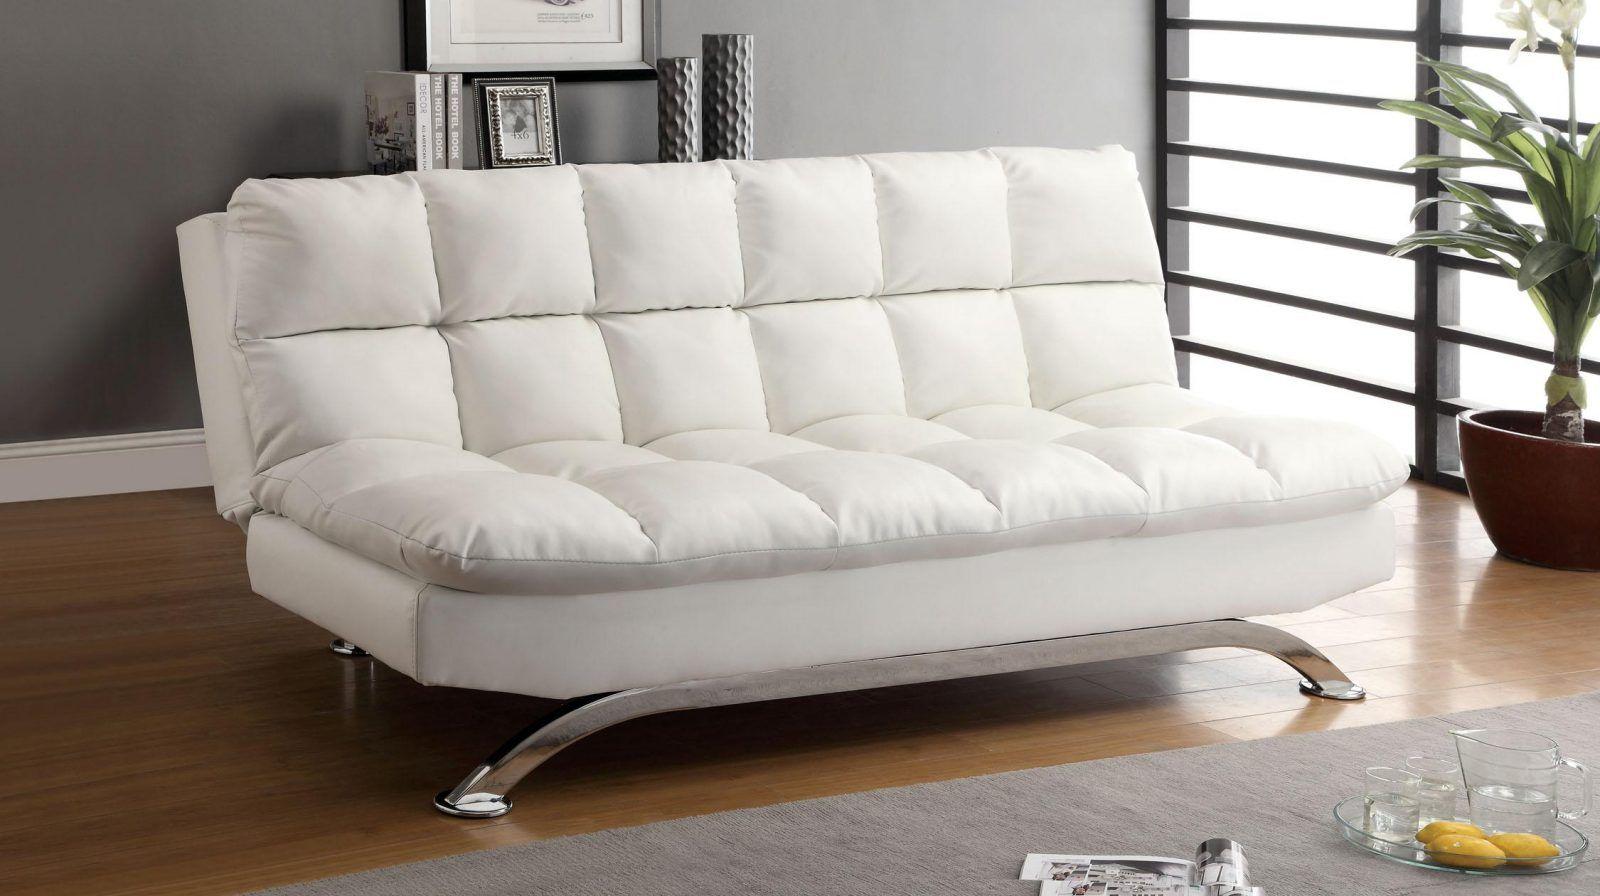 sofa cama barata de diseño blanco